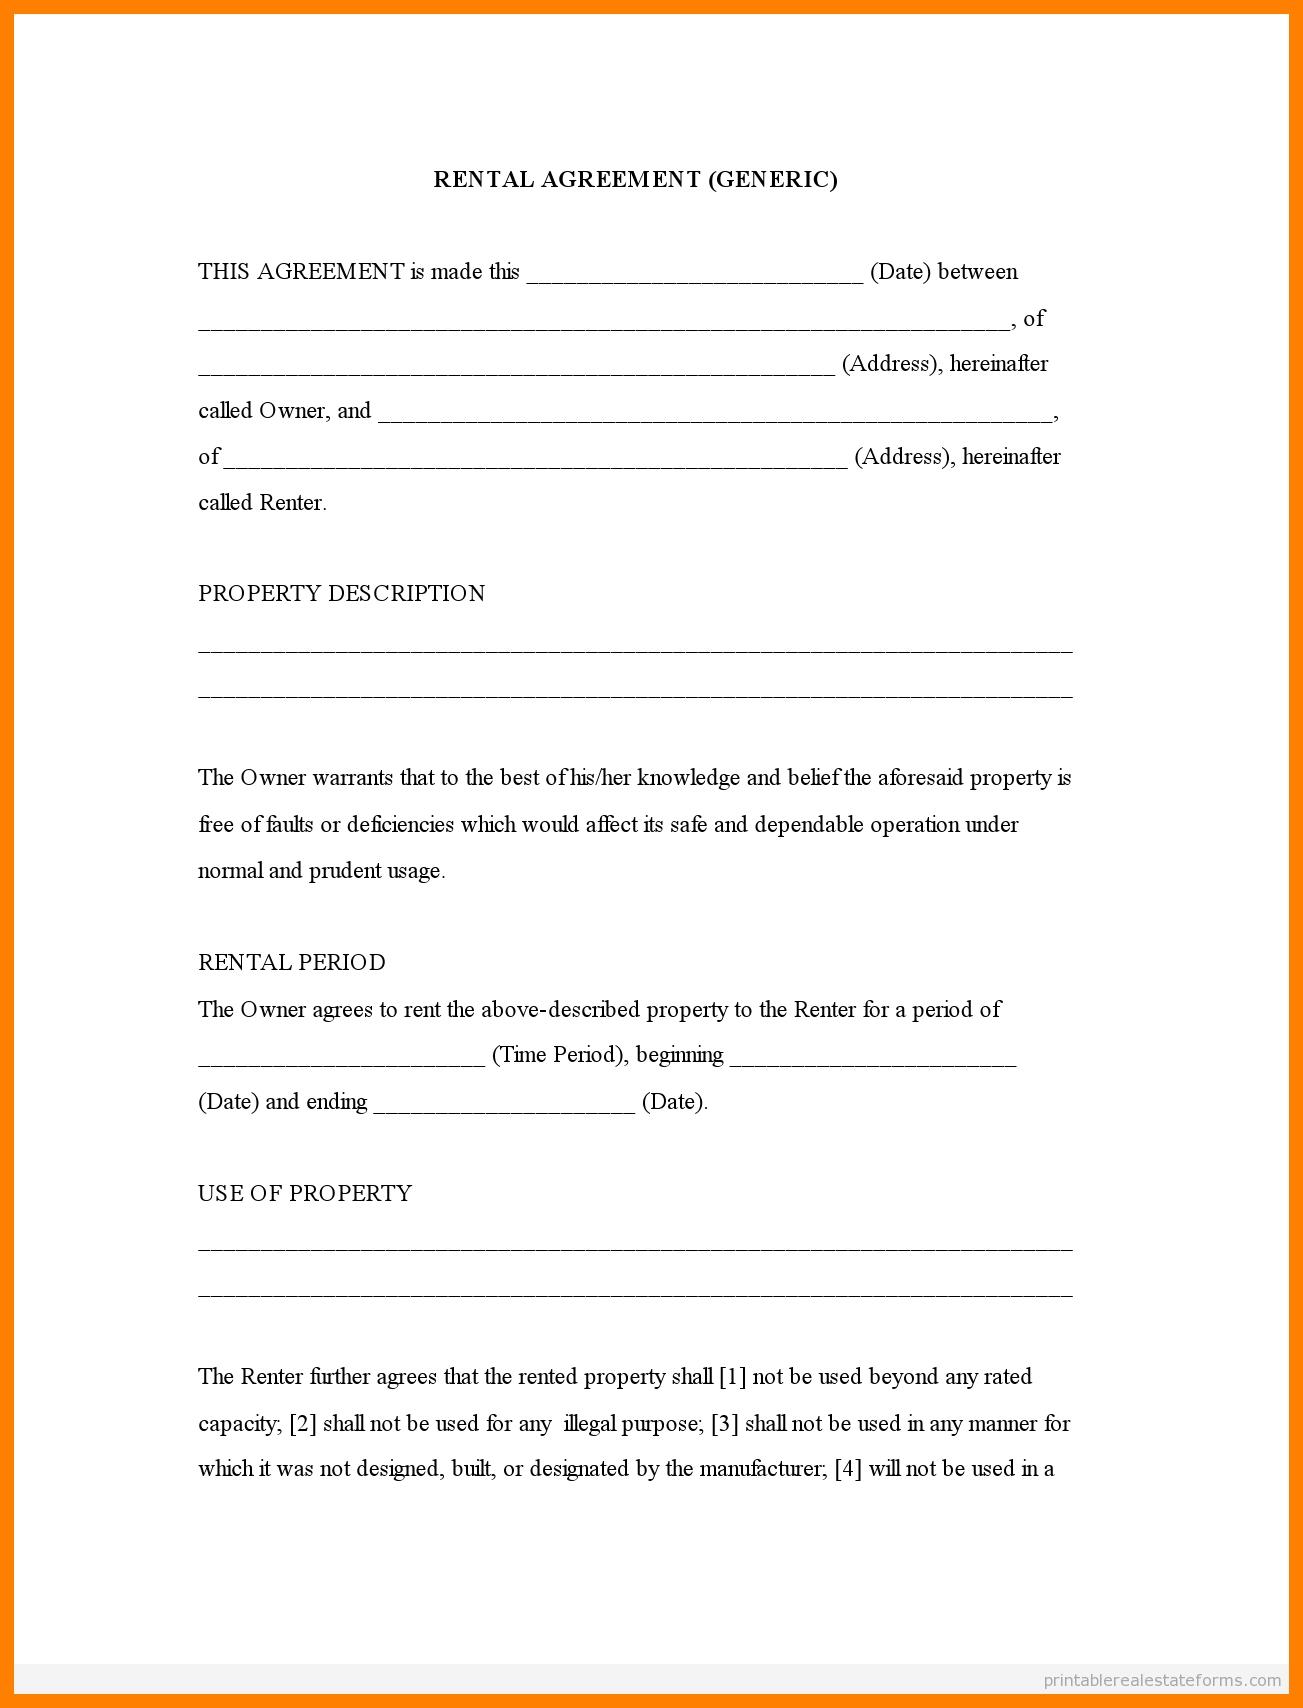 Free Printable Rental Agreement Forms | Bestprintable231118 - Rental Agreement Forms Free Printable